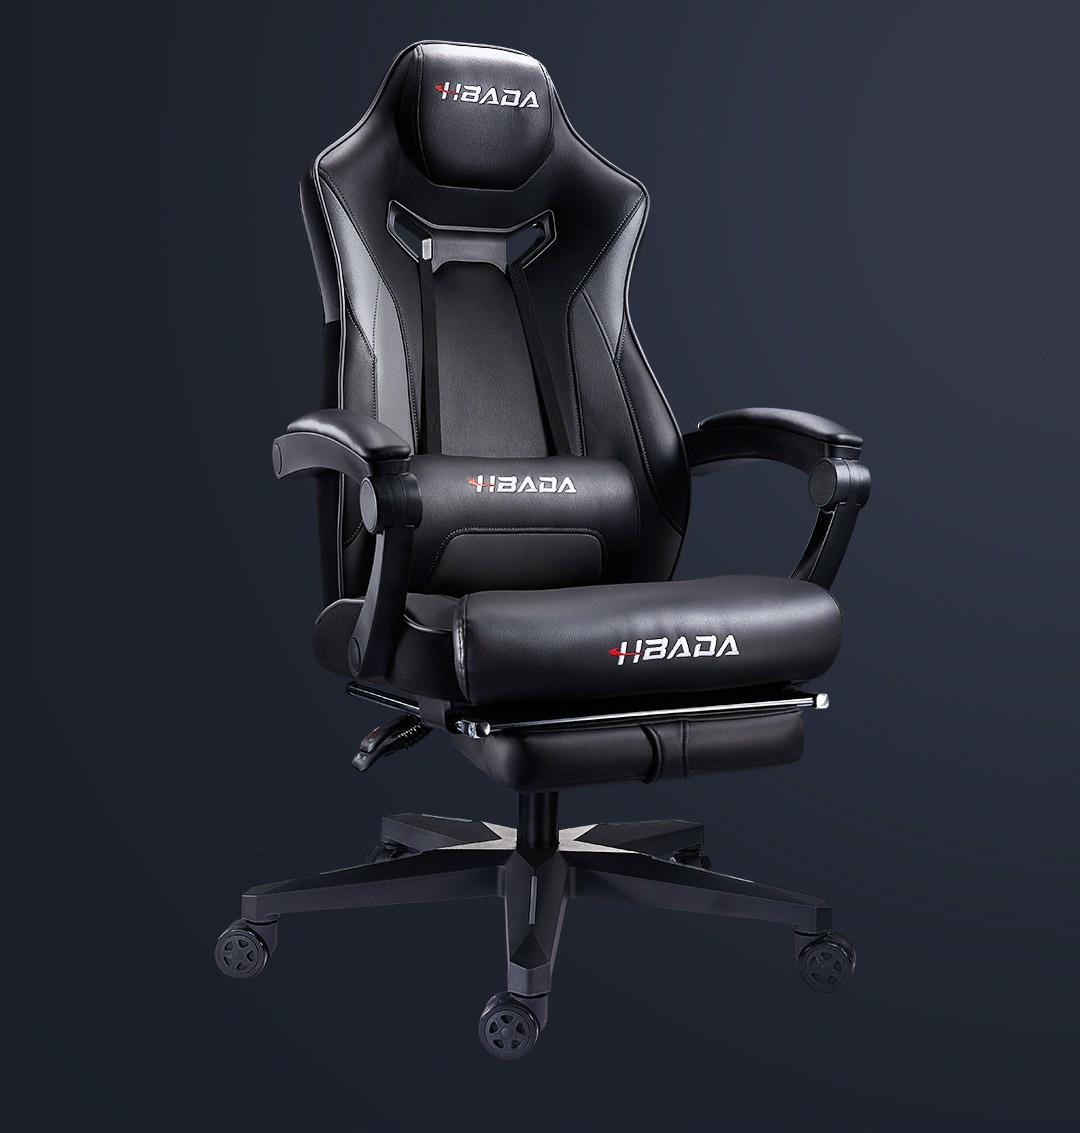 Xiaomi Hbada Gaming Chair Knight Edition